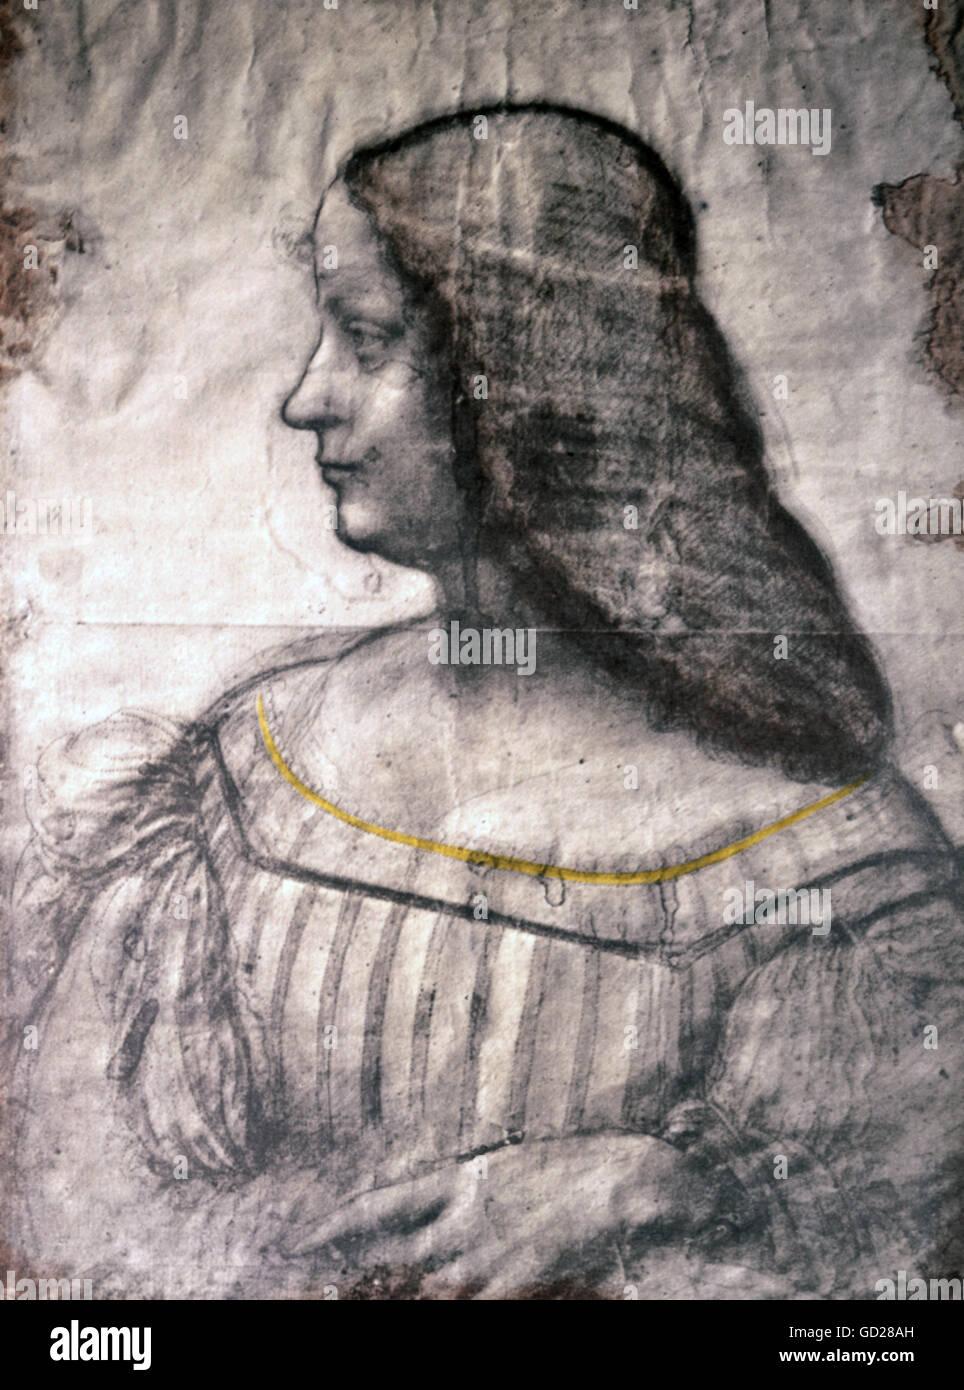 fine arts, Leonardo da Vinci (1452 - 1519), drawing, portrait study for a painting of Isabella d'Este (1474 - Stock Image